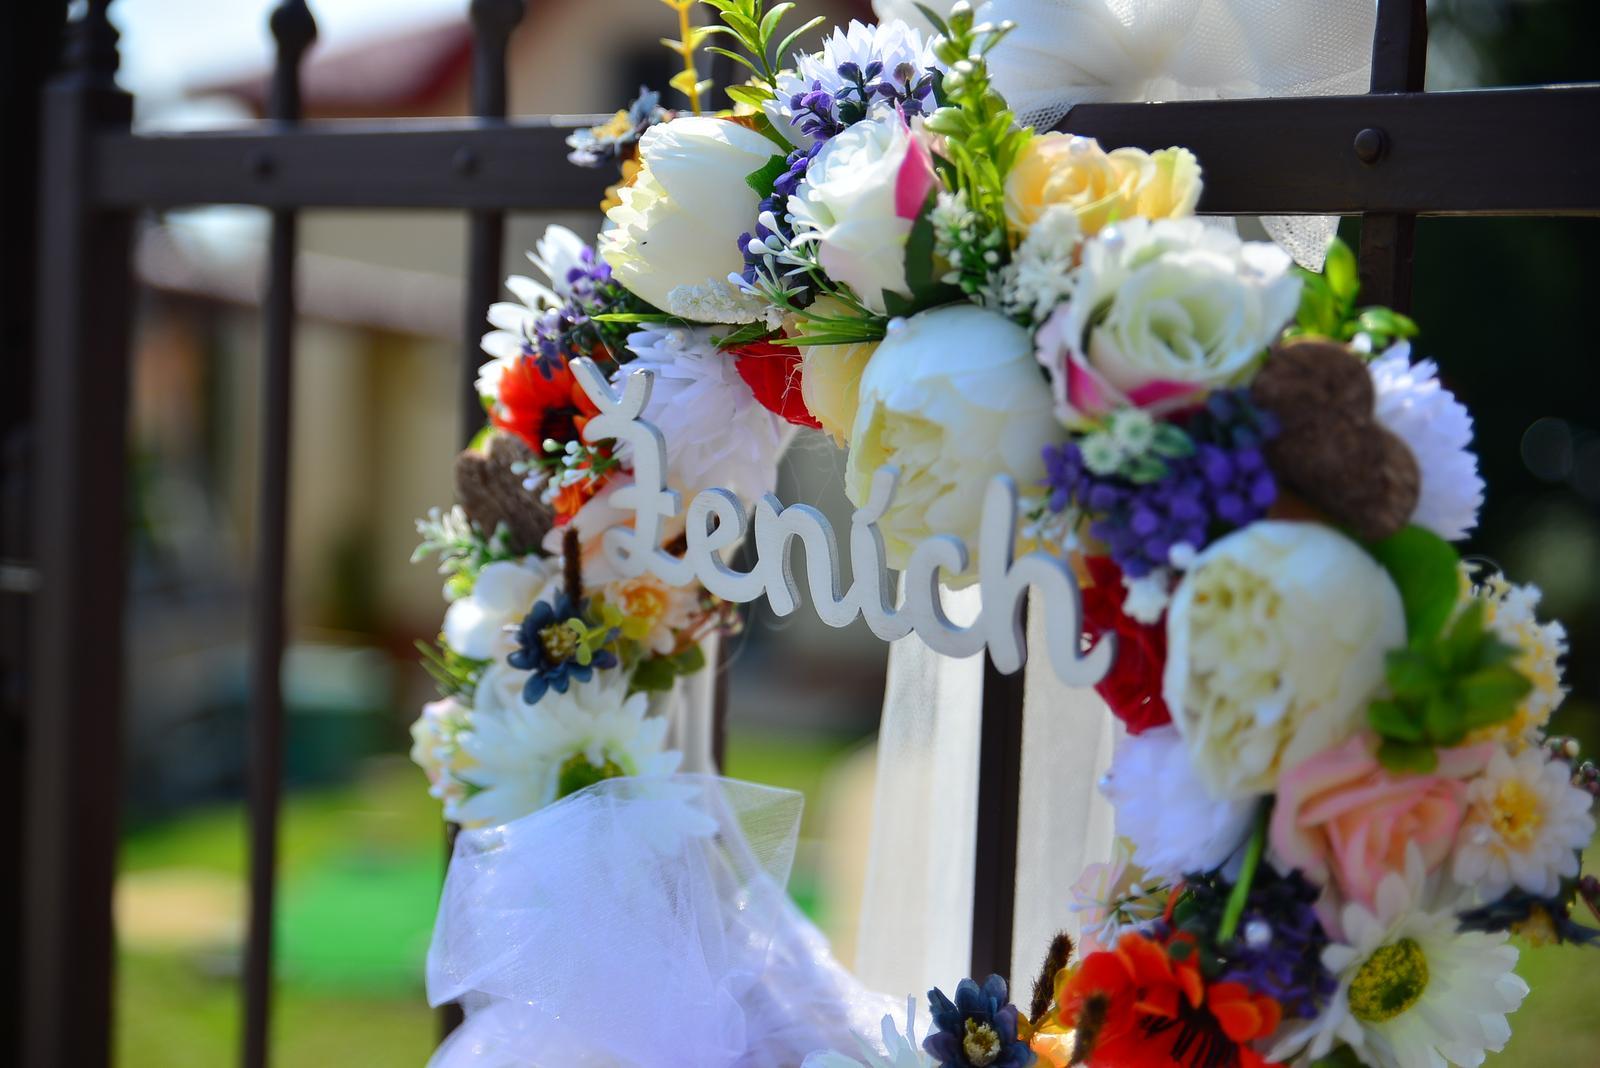 Folklorna svadba M+M, 24.8.2019 Turany - Folklorna svadba M+M, 24.8.2019 Turany, autor Foto: Multimediálny DJ Maroš Chvojka 014